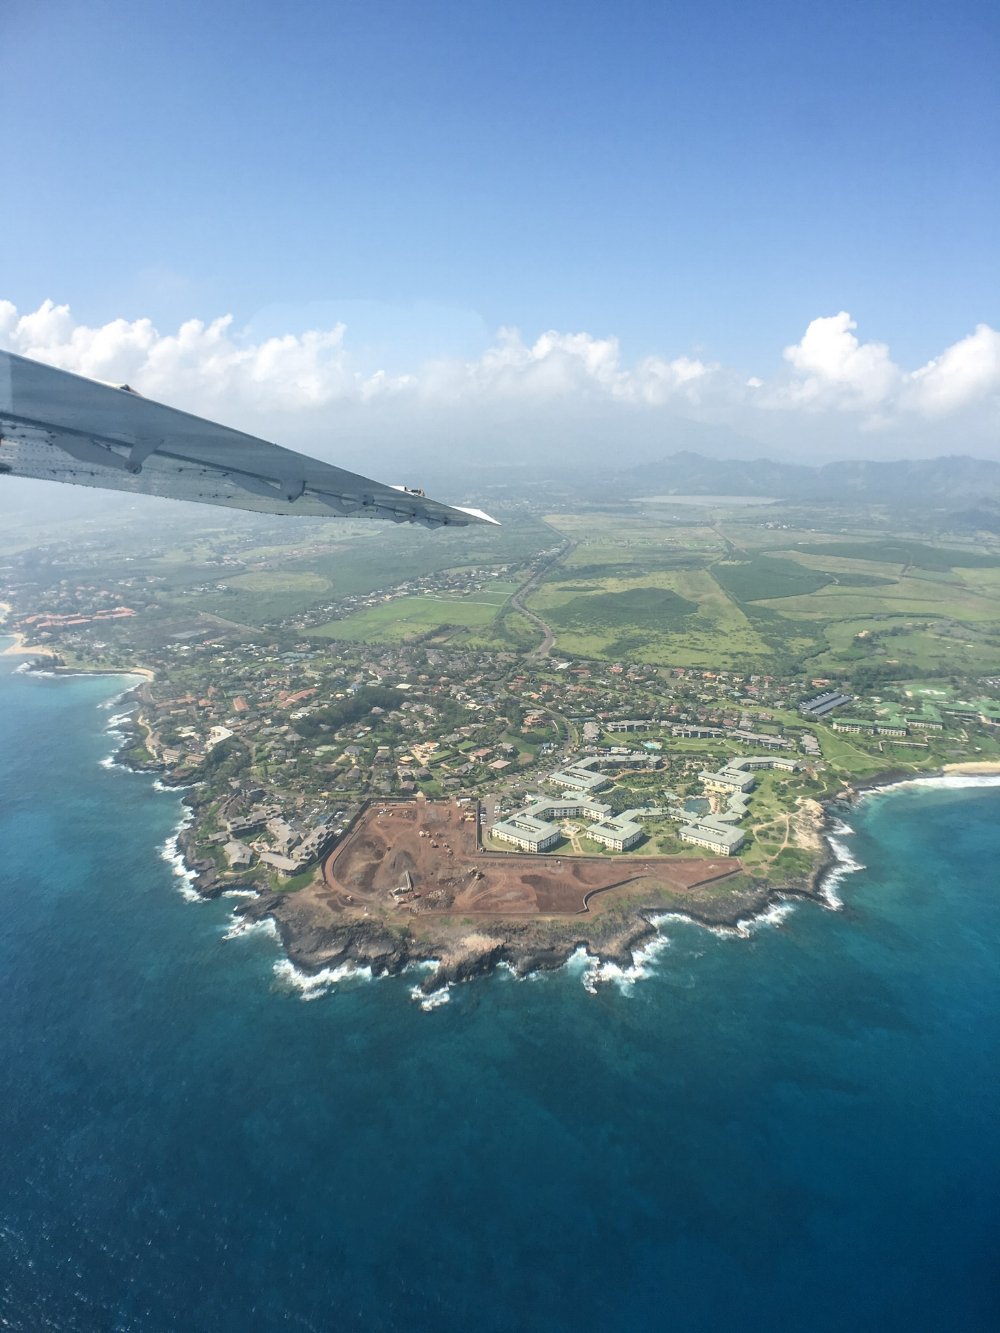 curio.trips.hawaii.kauai.coast.beach.1.jpg